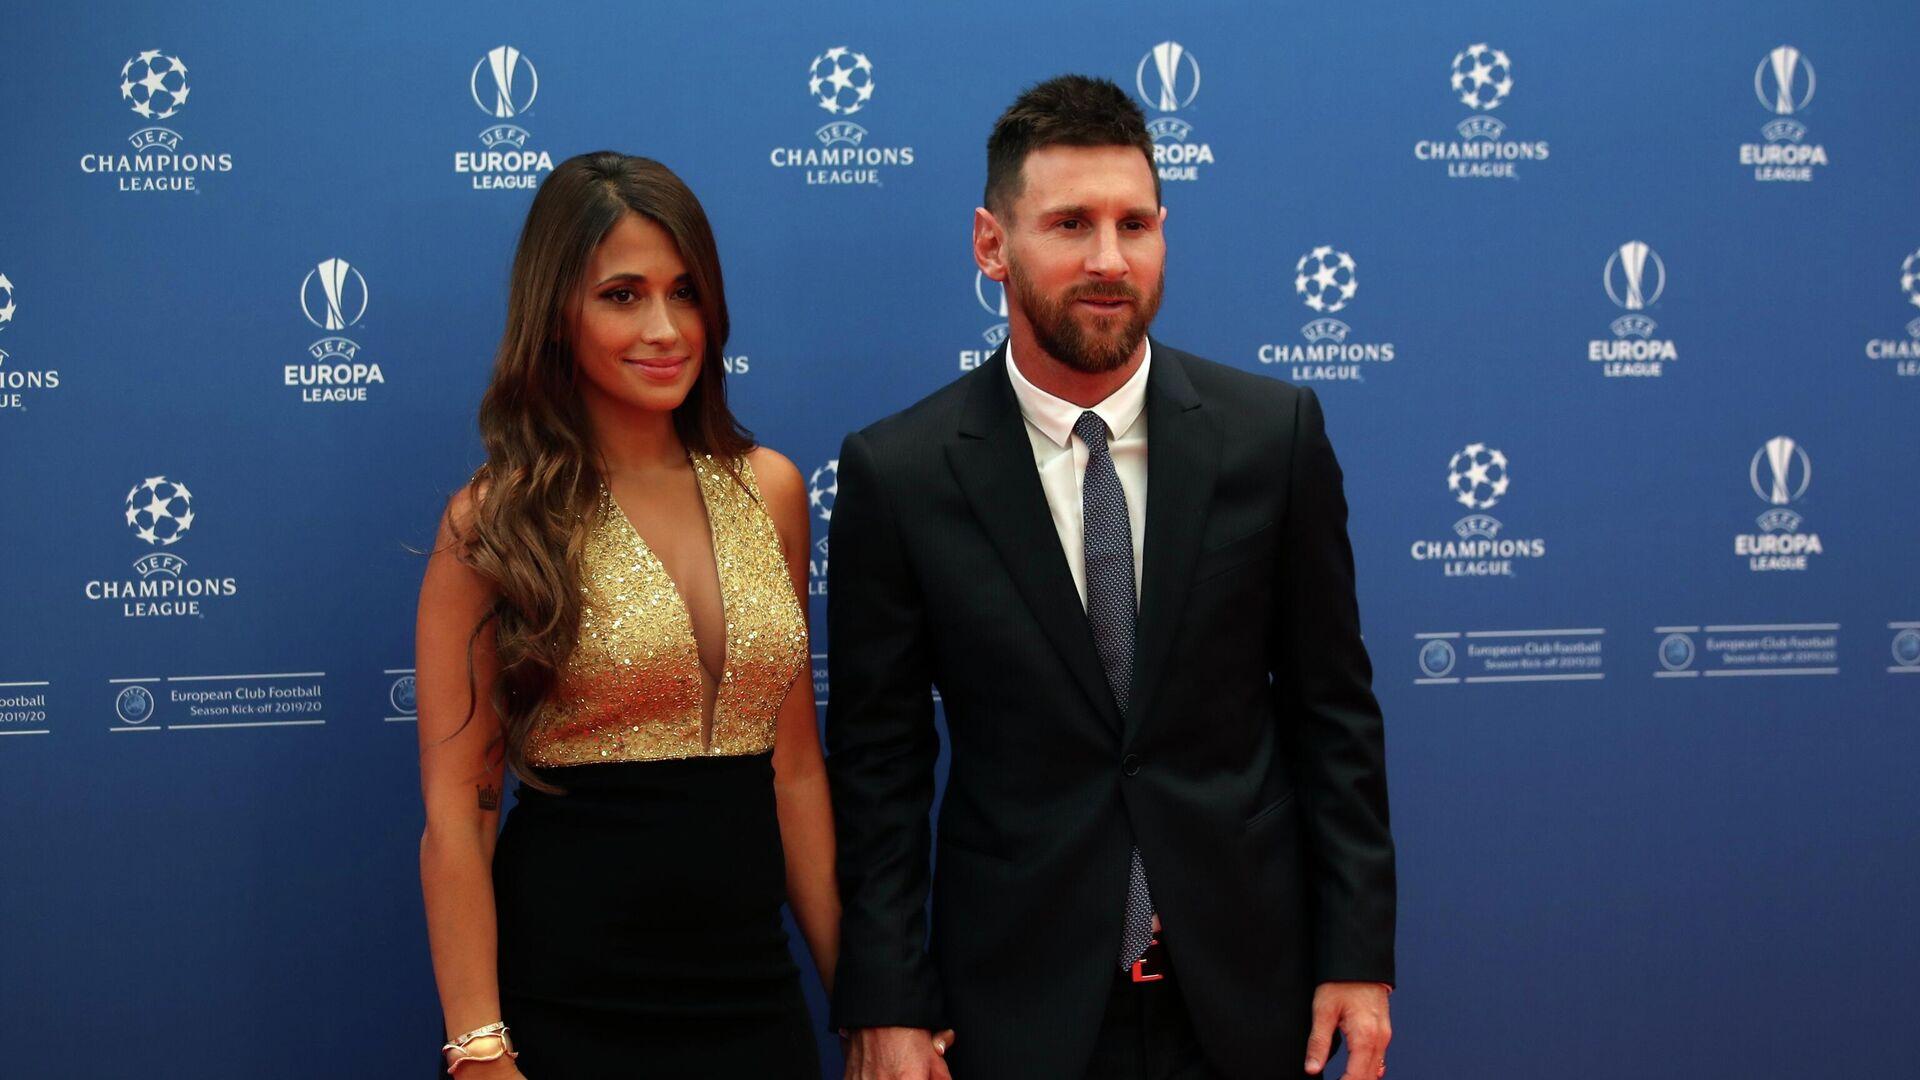 El futbolista Lionel Messi junto a su esposa Antonella Roccuzzo - Sputnik Mundo, 1920, 03.09.2021